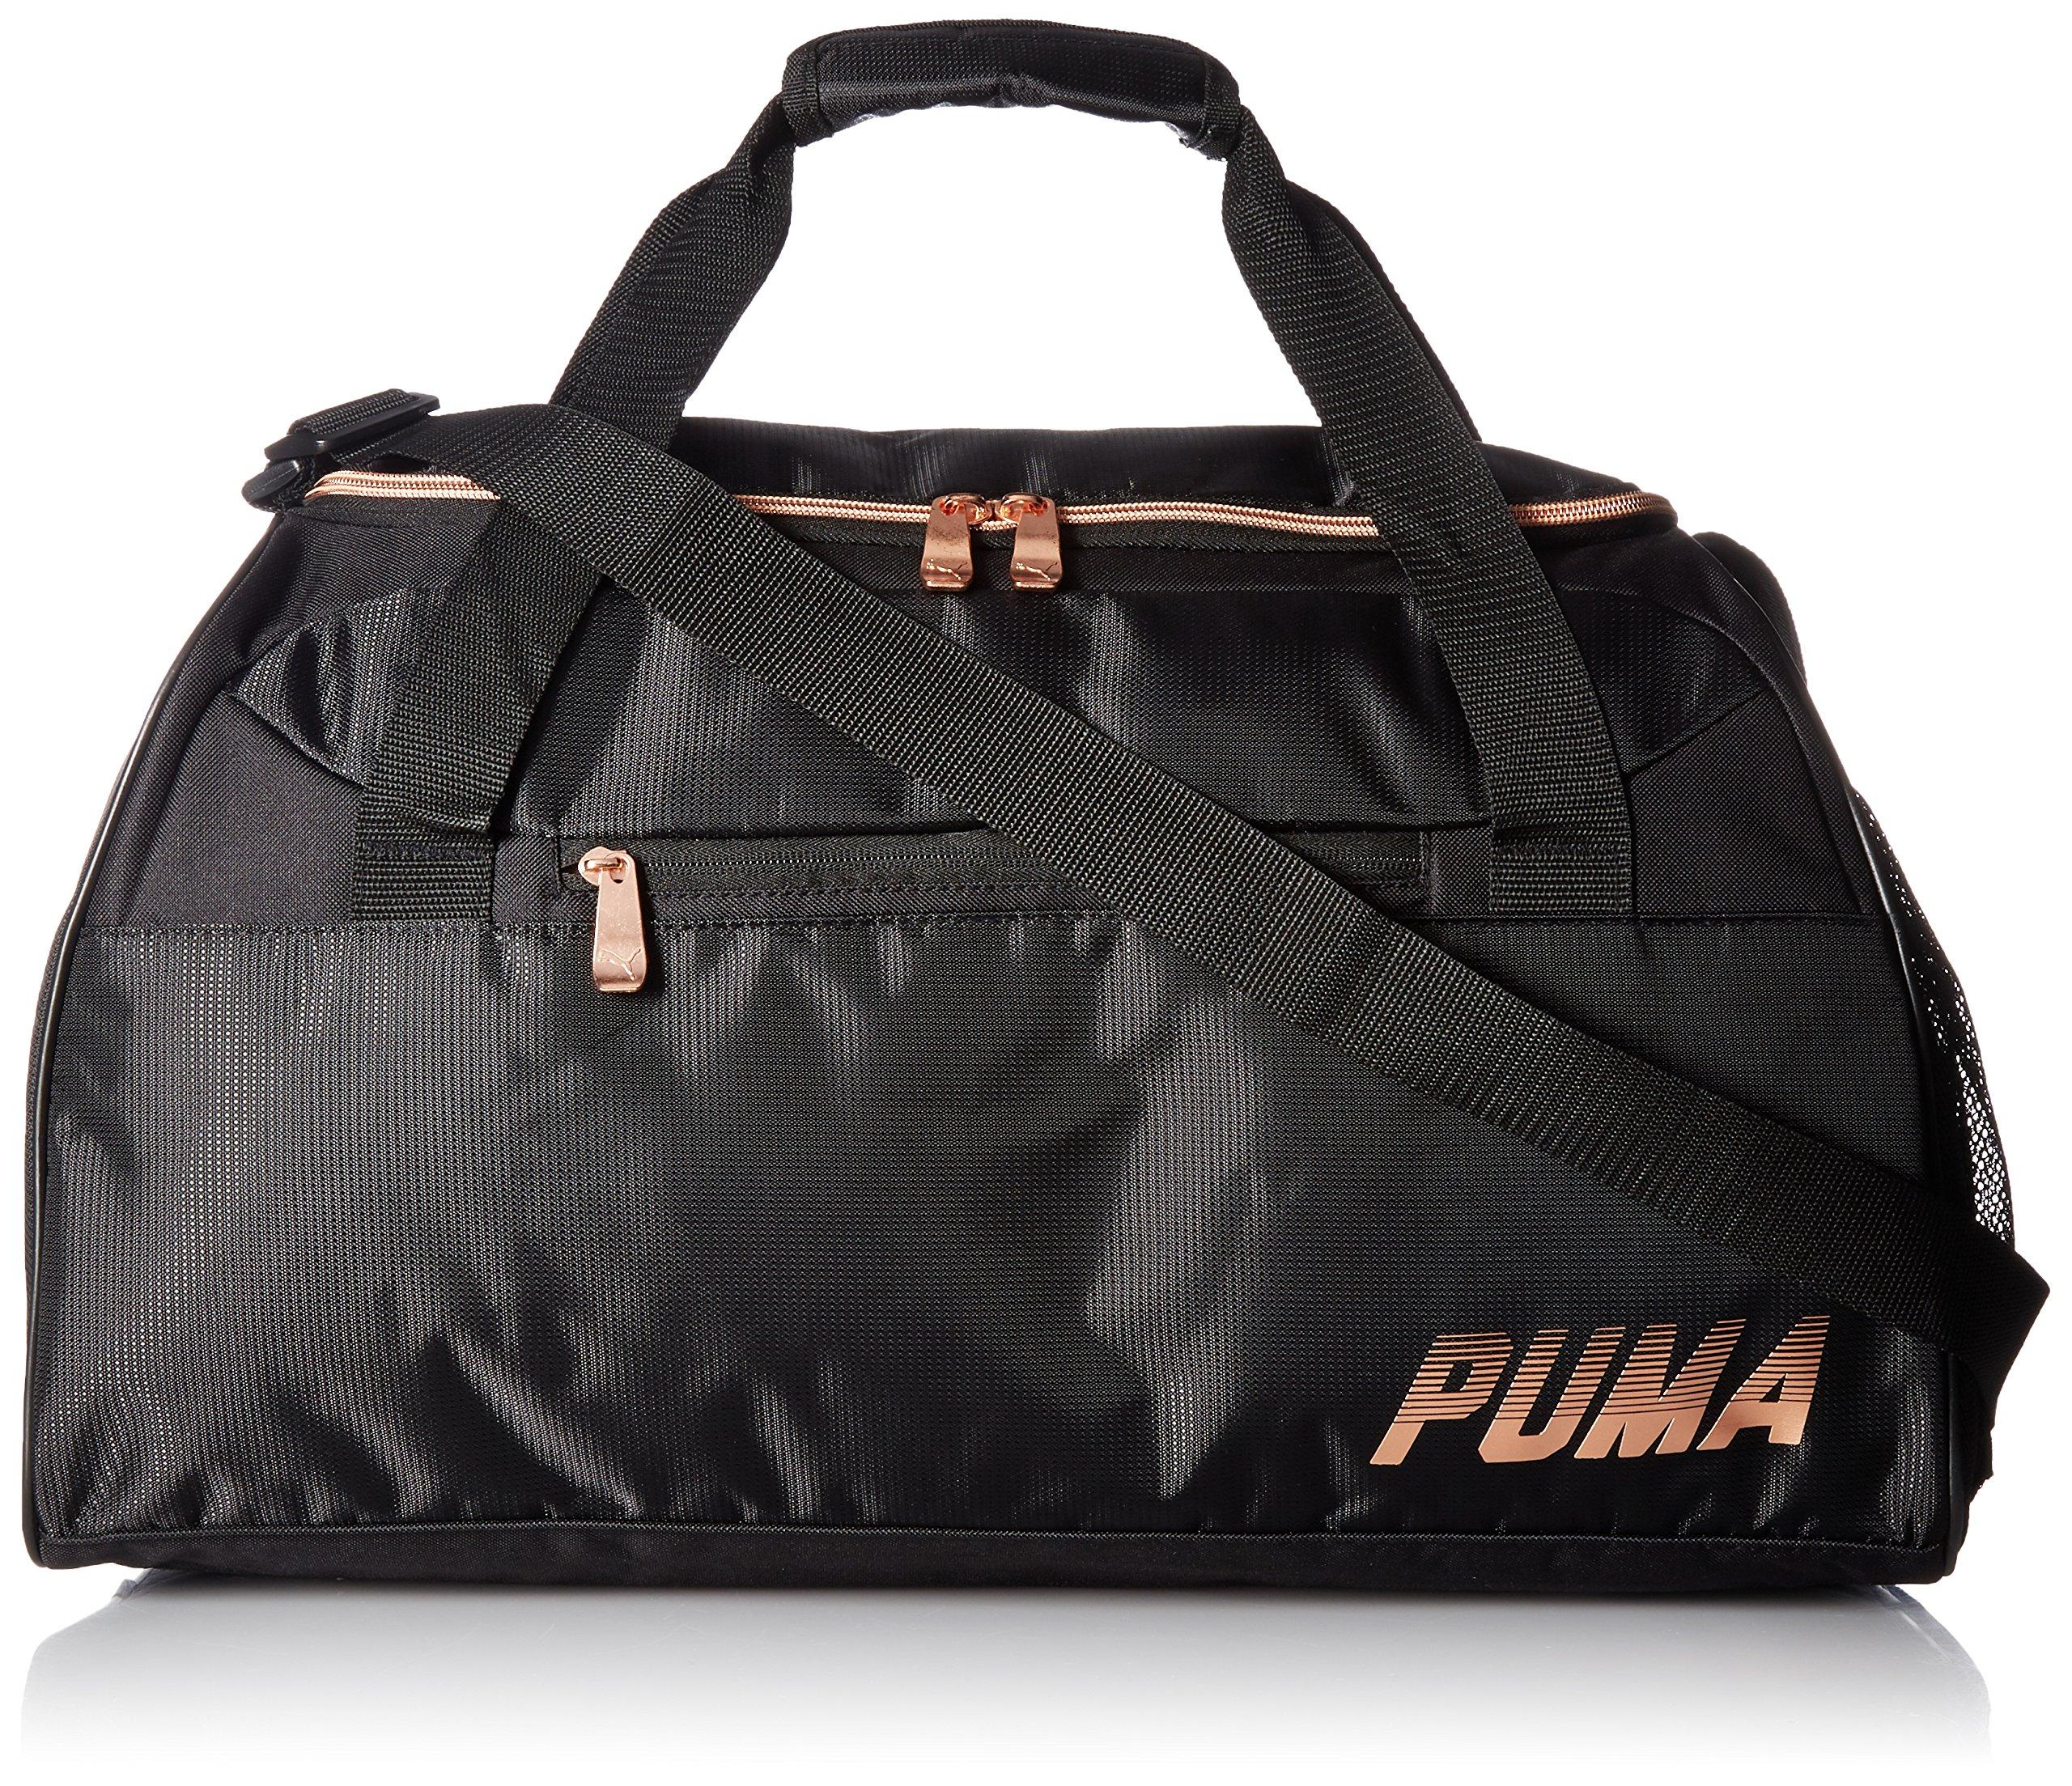 PUMA Puma Evercat  - レディーストラベルバッグのアラインメント